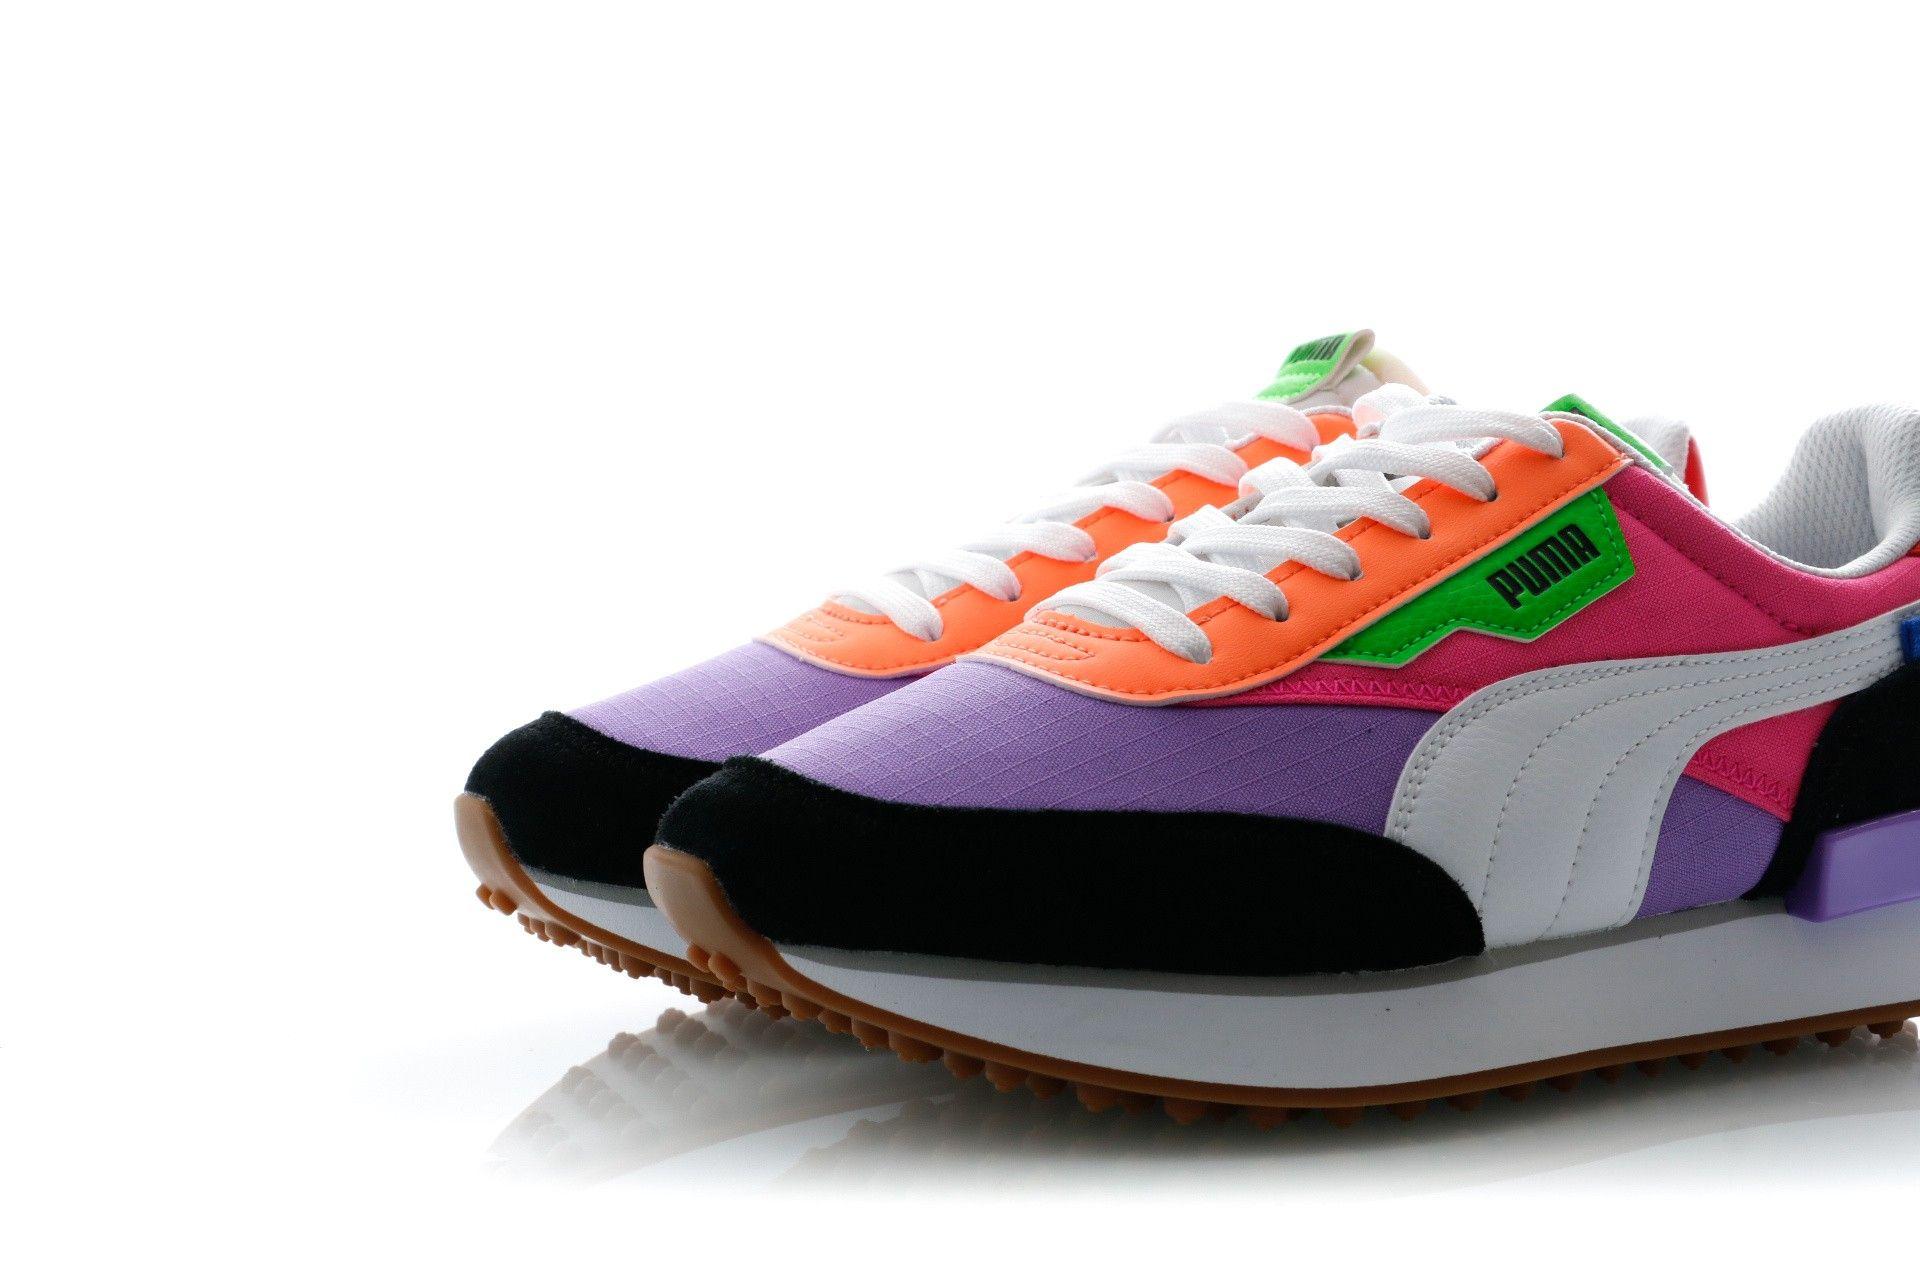 Puma Sneakers Rider Play On Luminous Purple Fluo Pink 371149 03